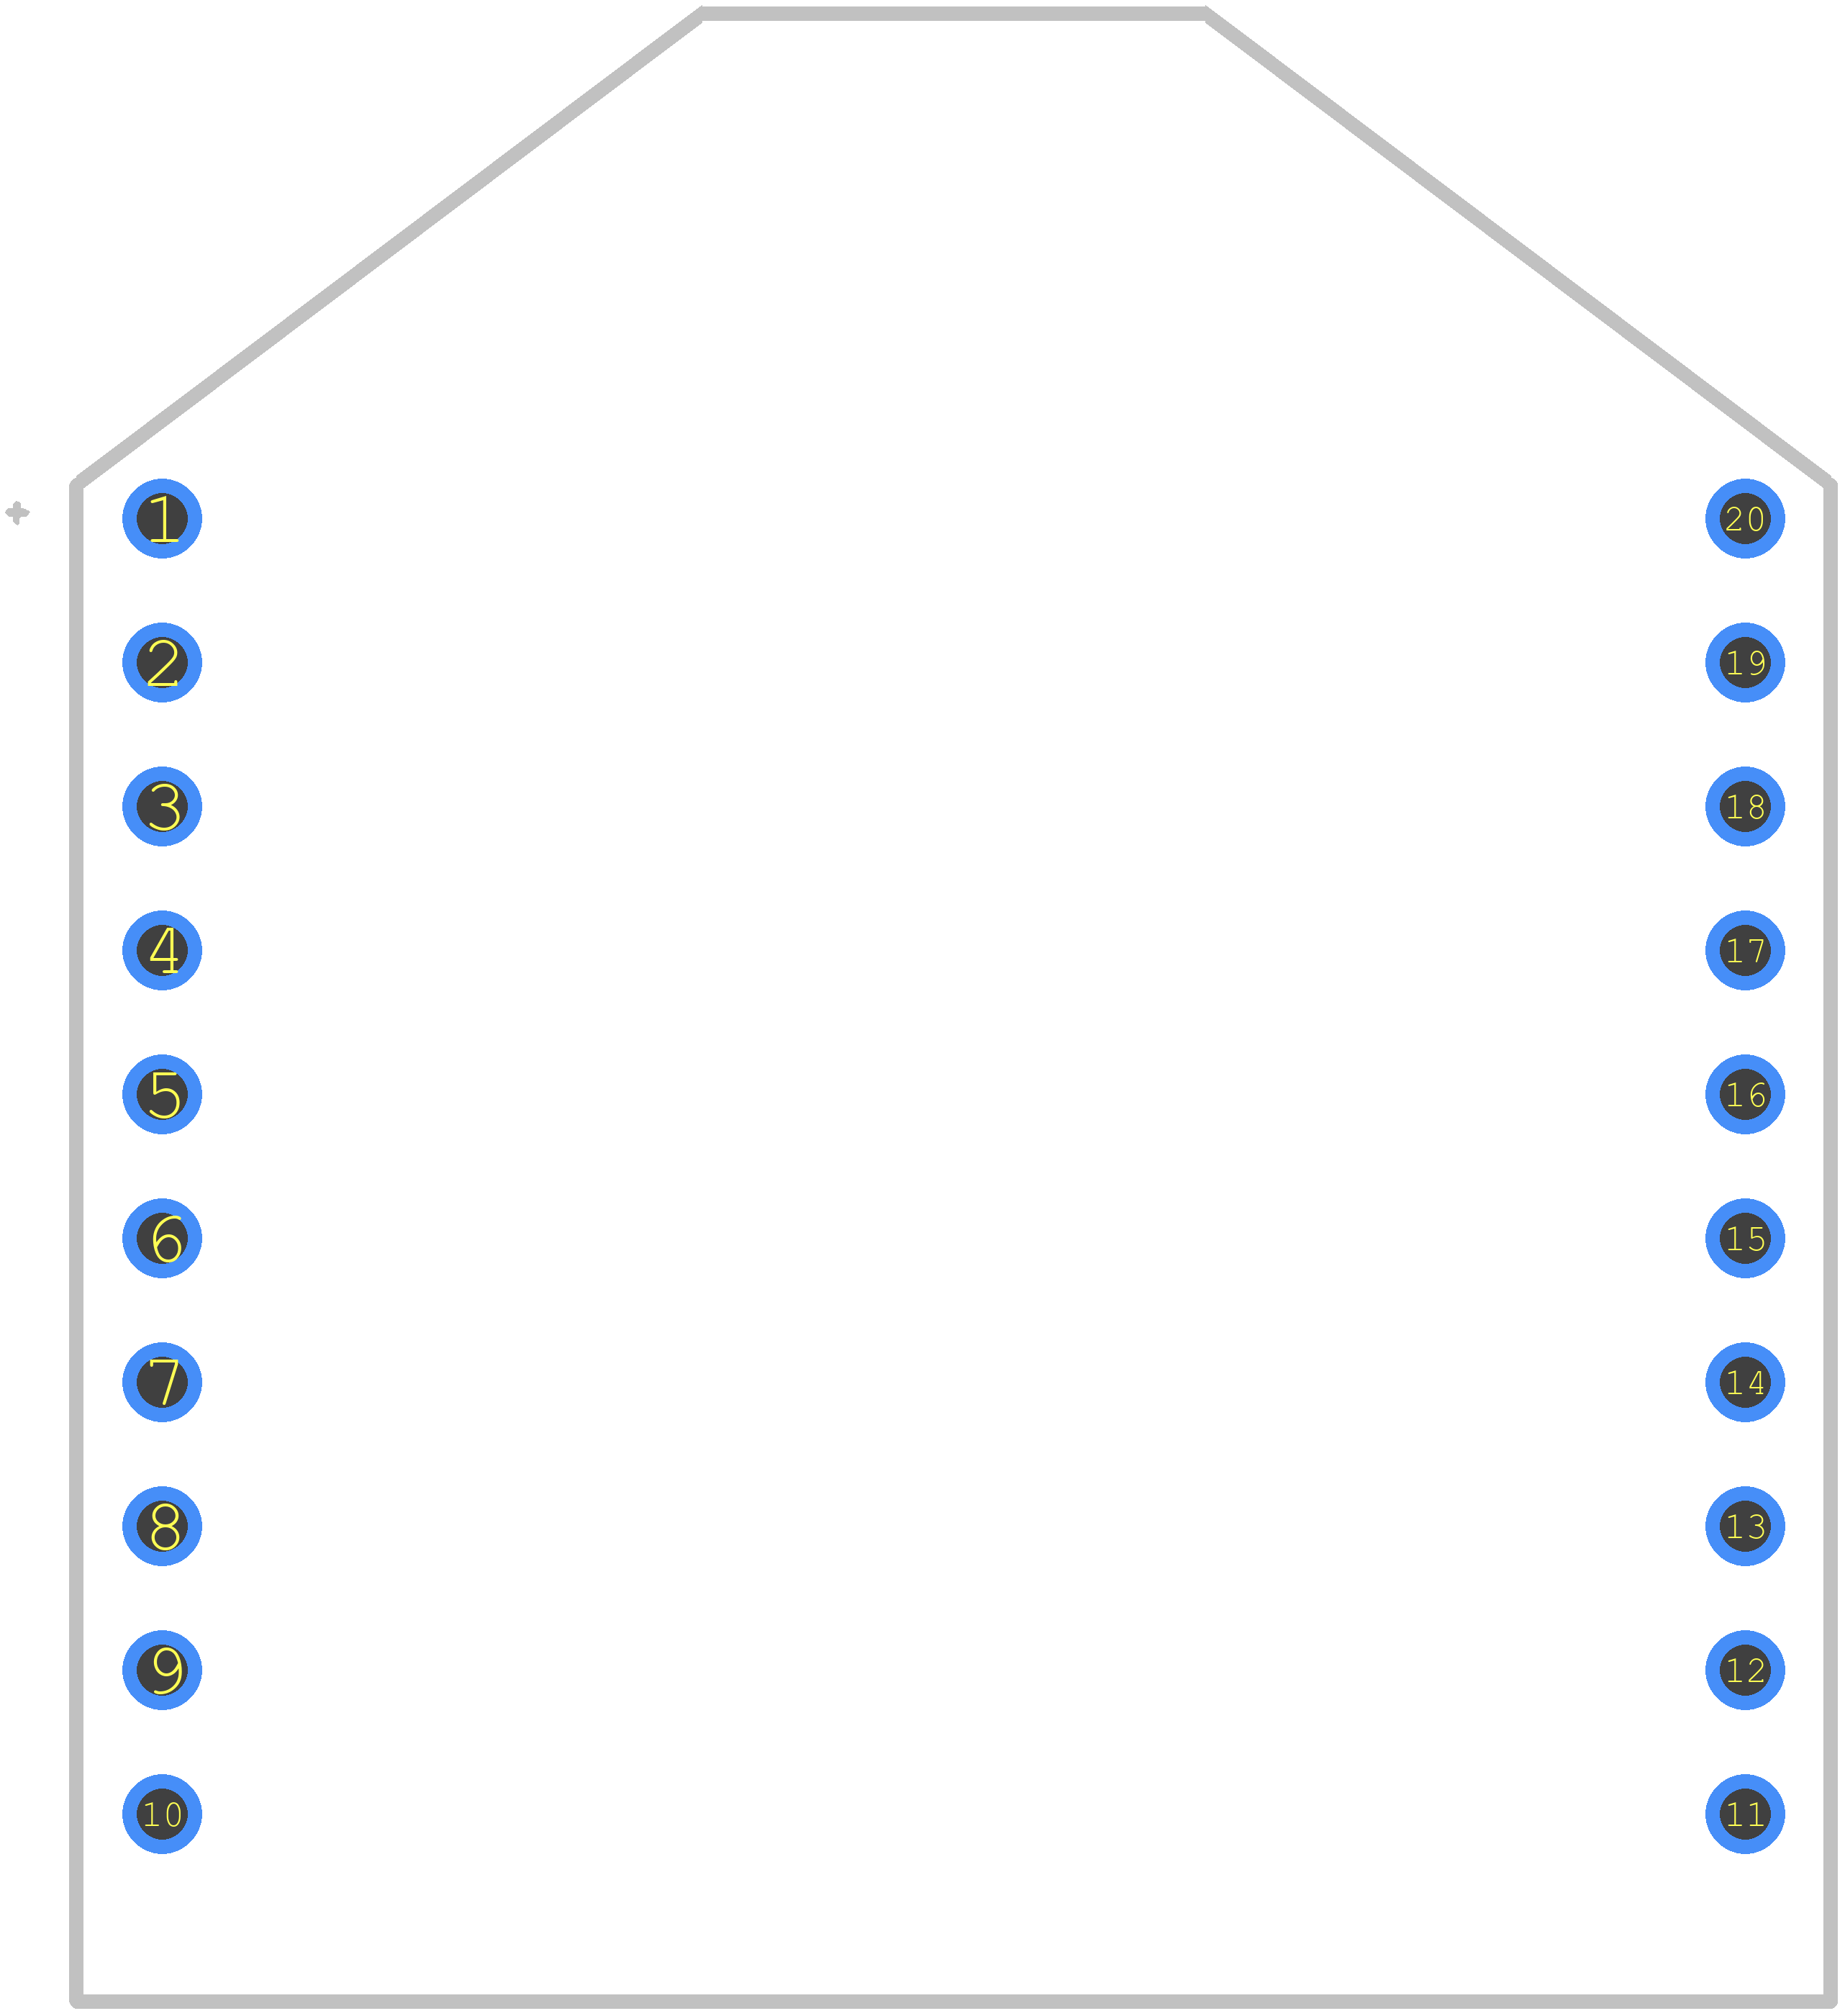 XB24CAPIT-001 - Digi International PCB footprint - Other - Digi XBee 802.15.4